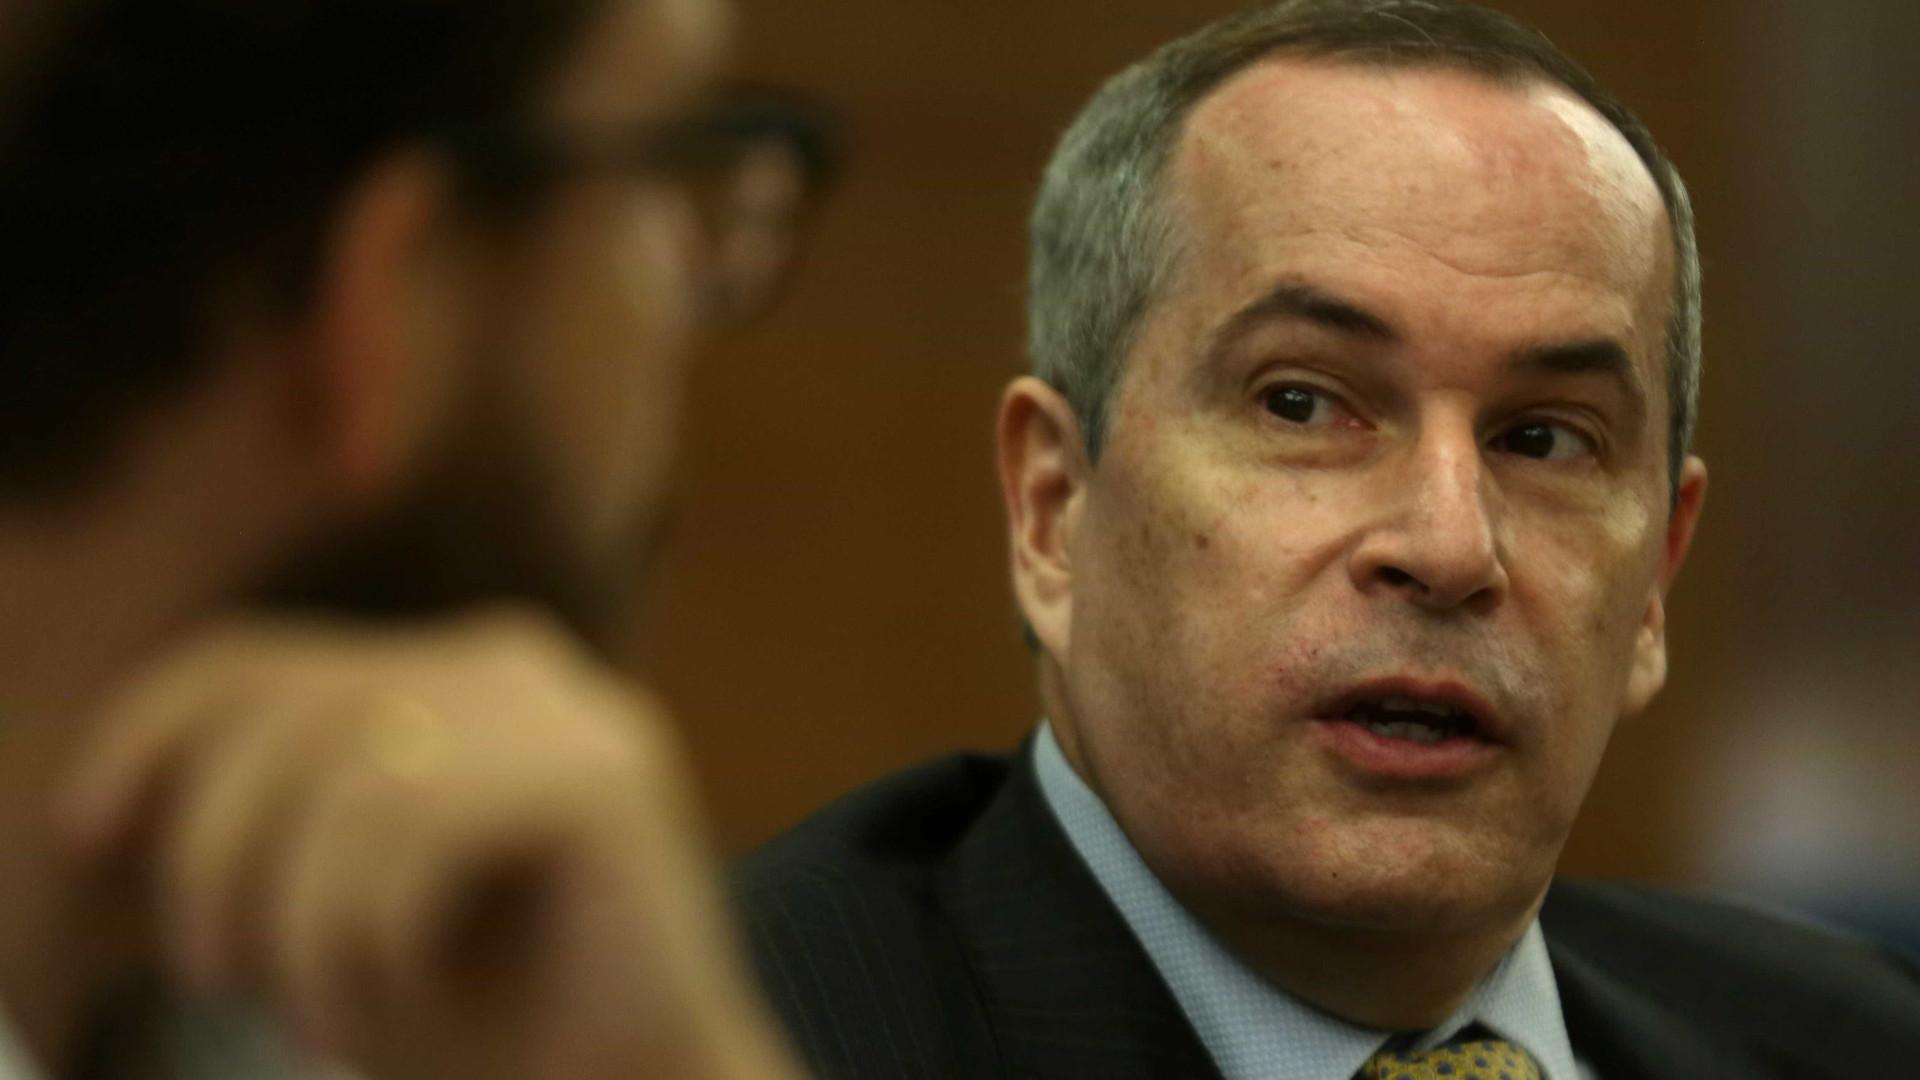 Chefe de agência reguladora do petróleo renuncia ao cargo